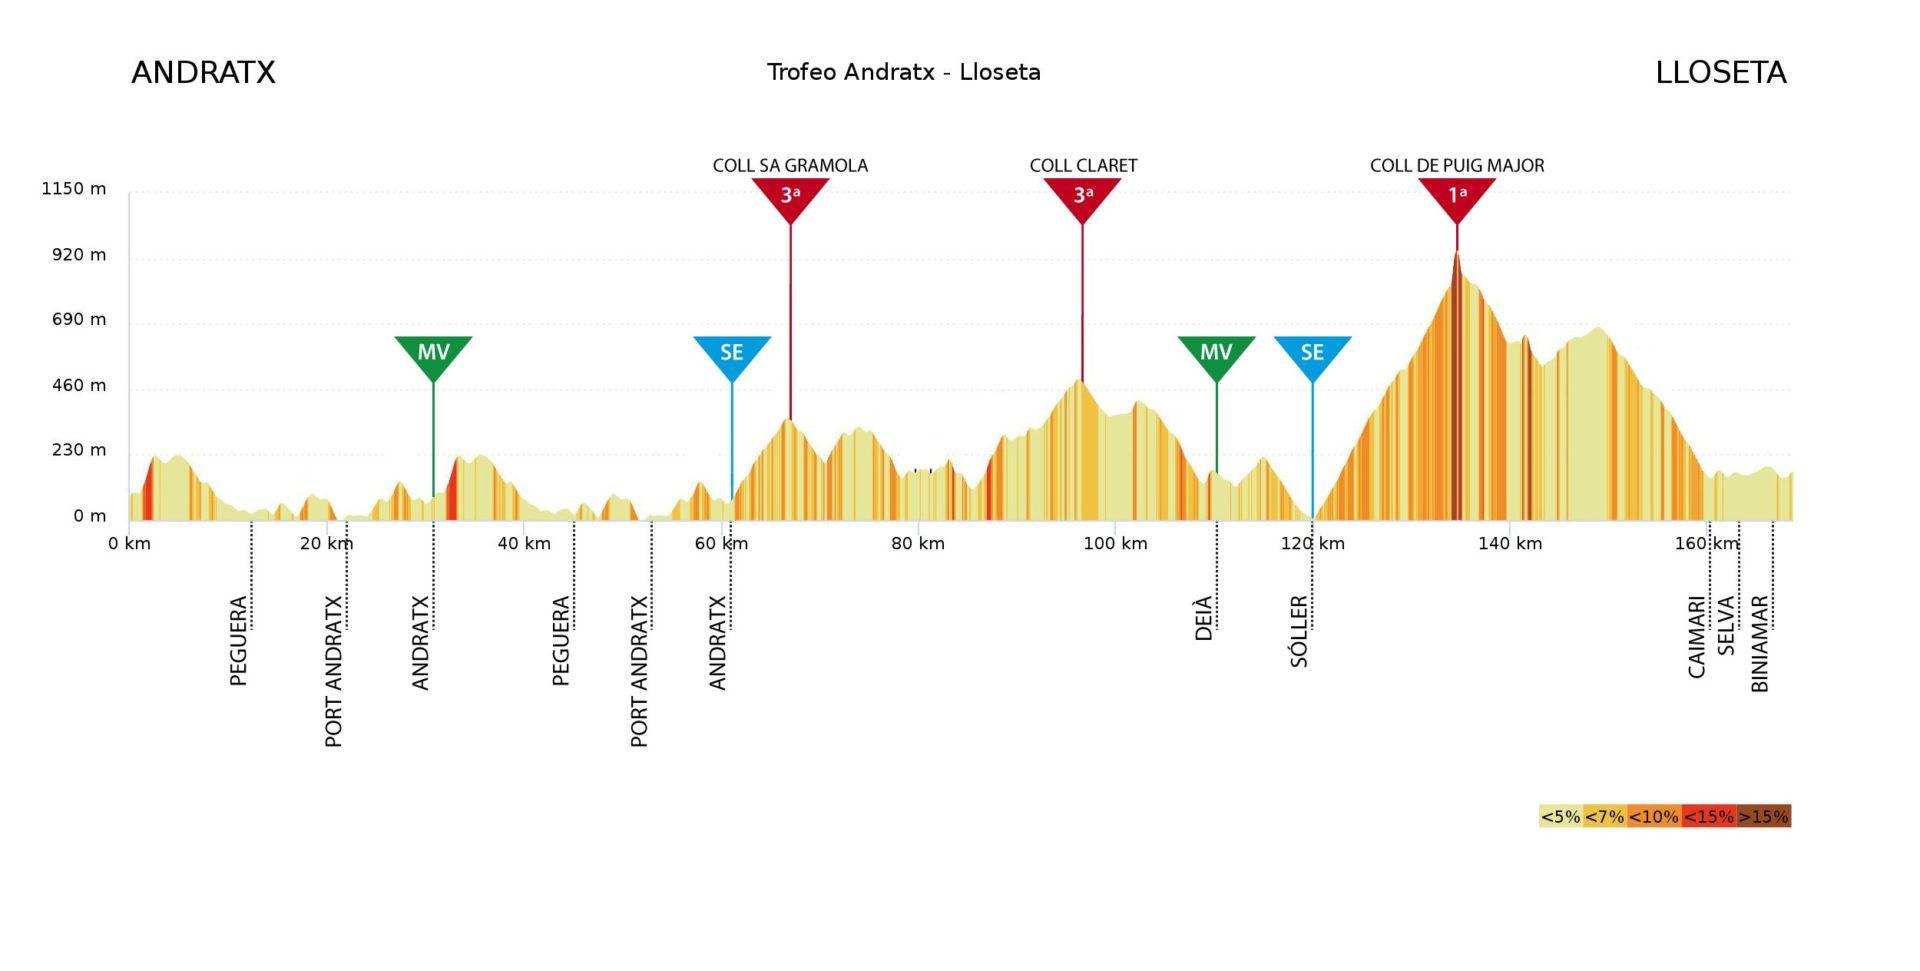 Trofeo Andratx – Lloseta. 172,4 km